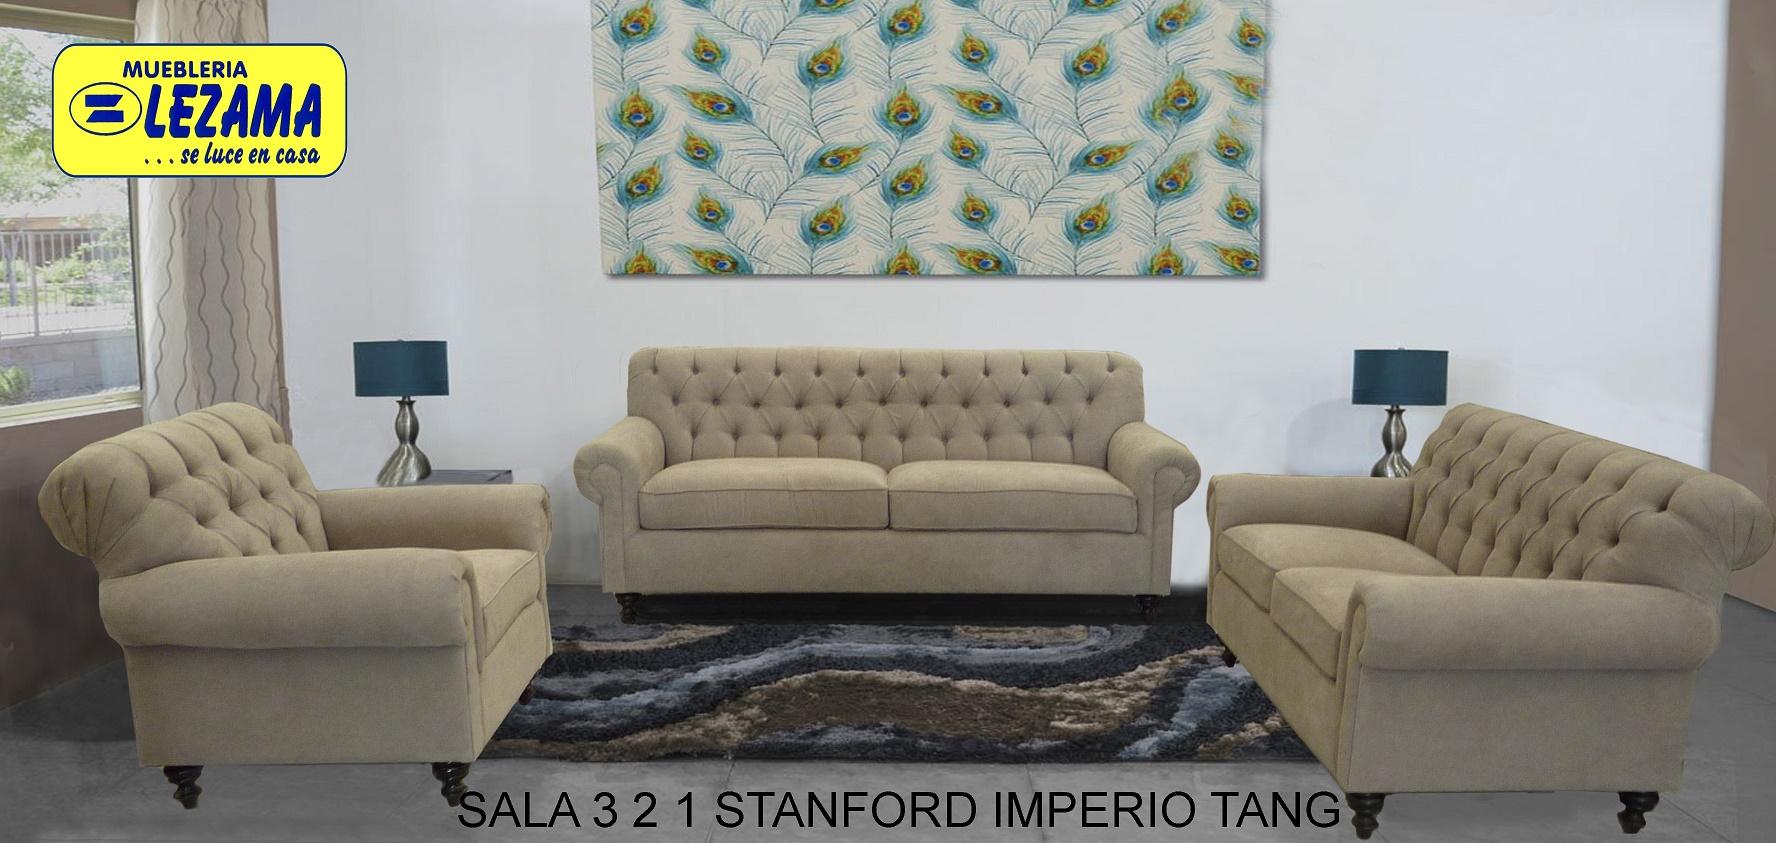 SALA__3_2_1_STANFORD_IMPERIO_TANG_PERFECTA.jpg